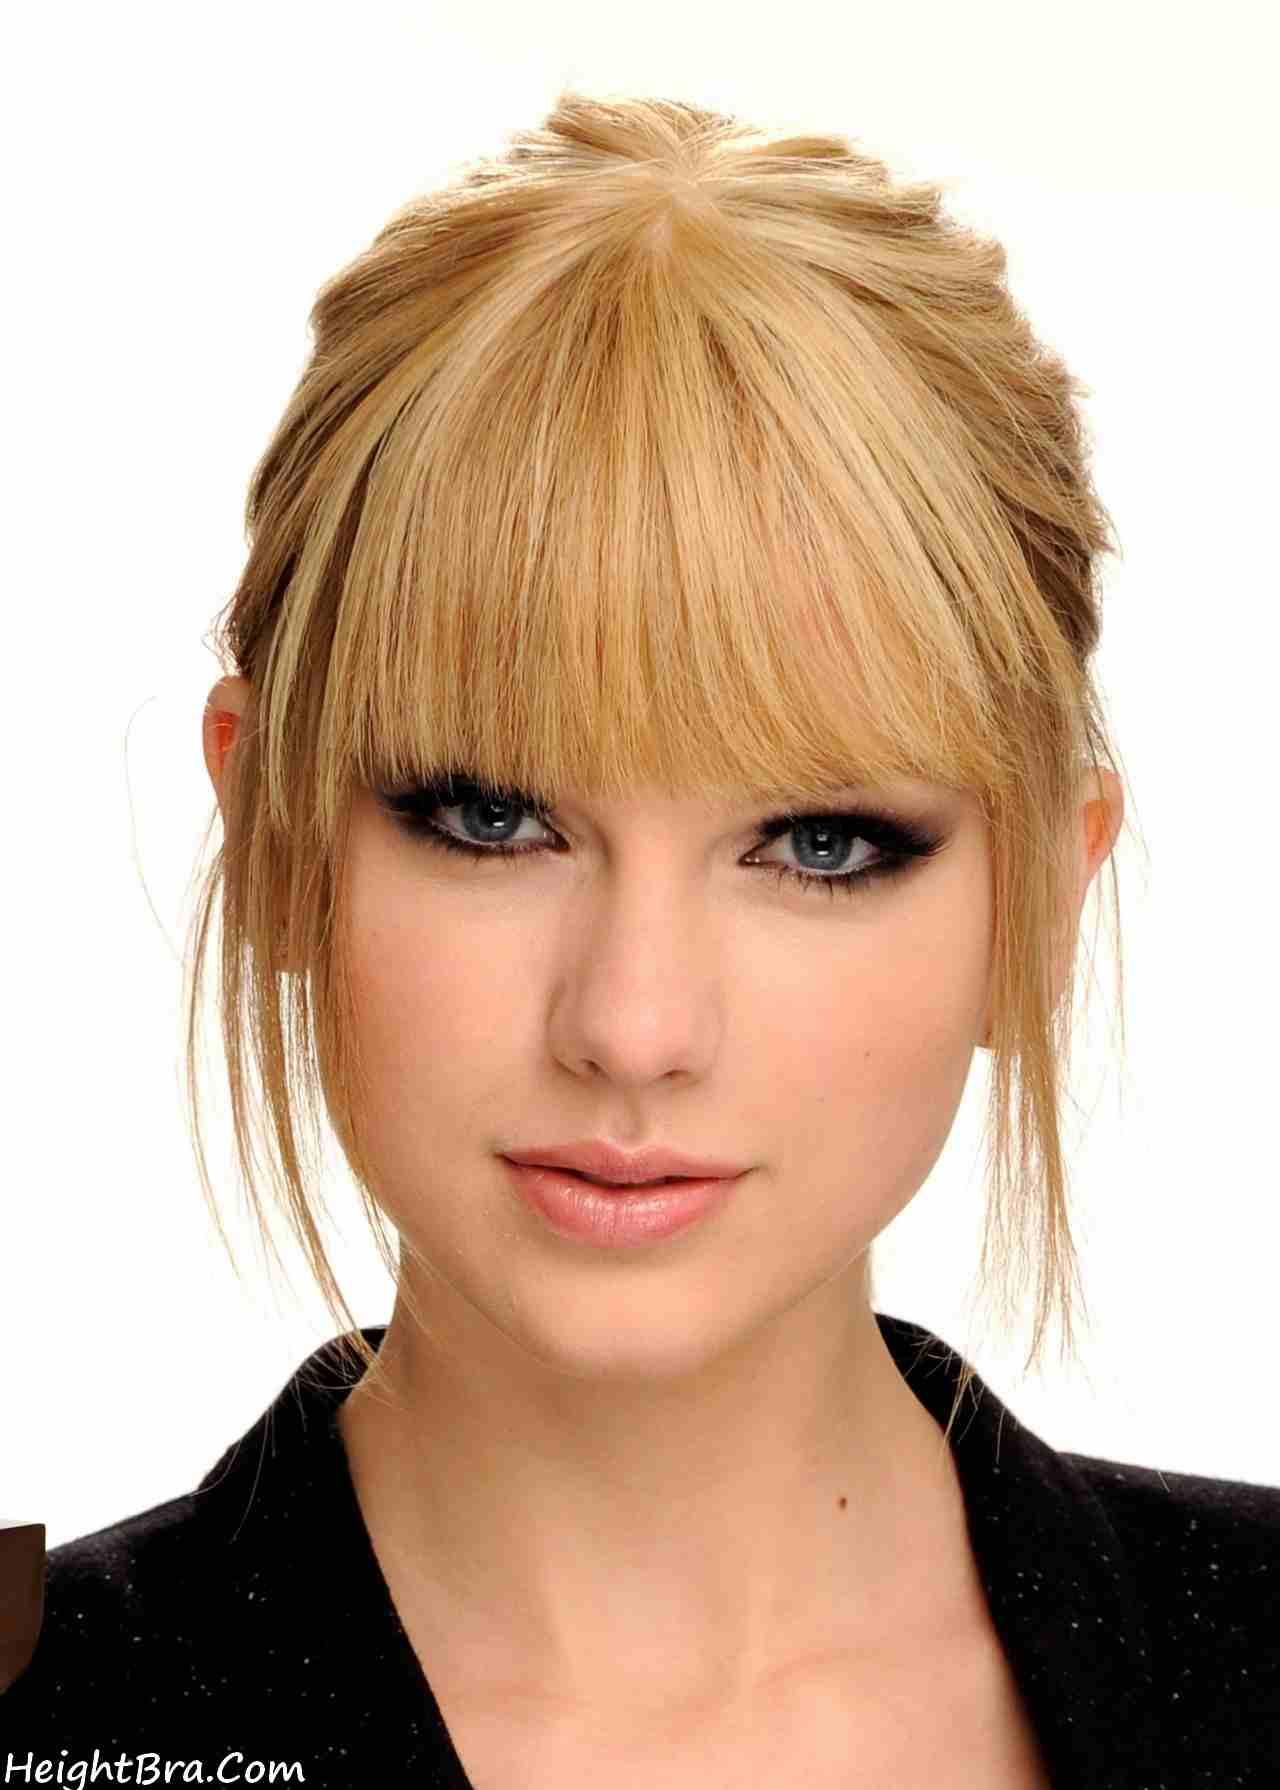 Taylor Swift Height, Weight, Bra, Bio, Figure Size ...